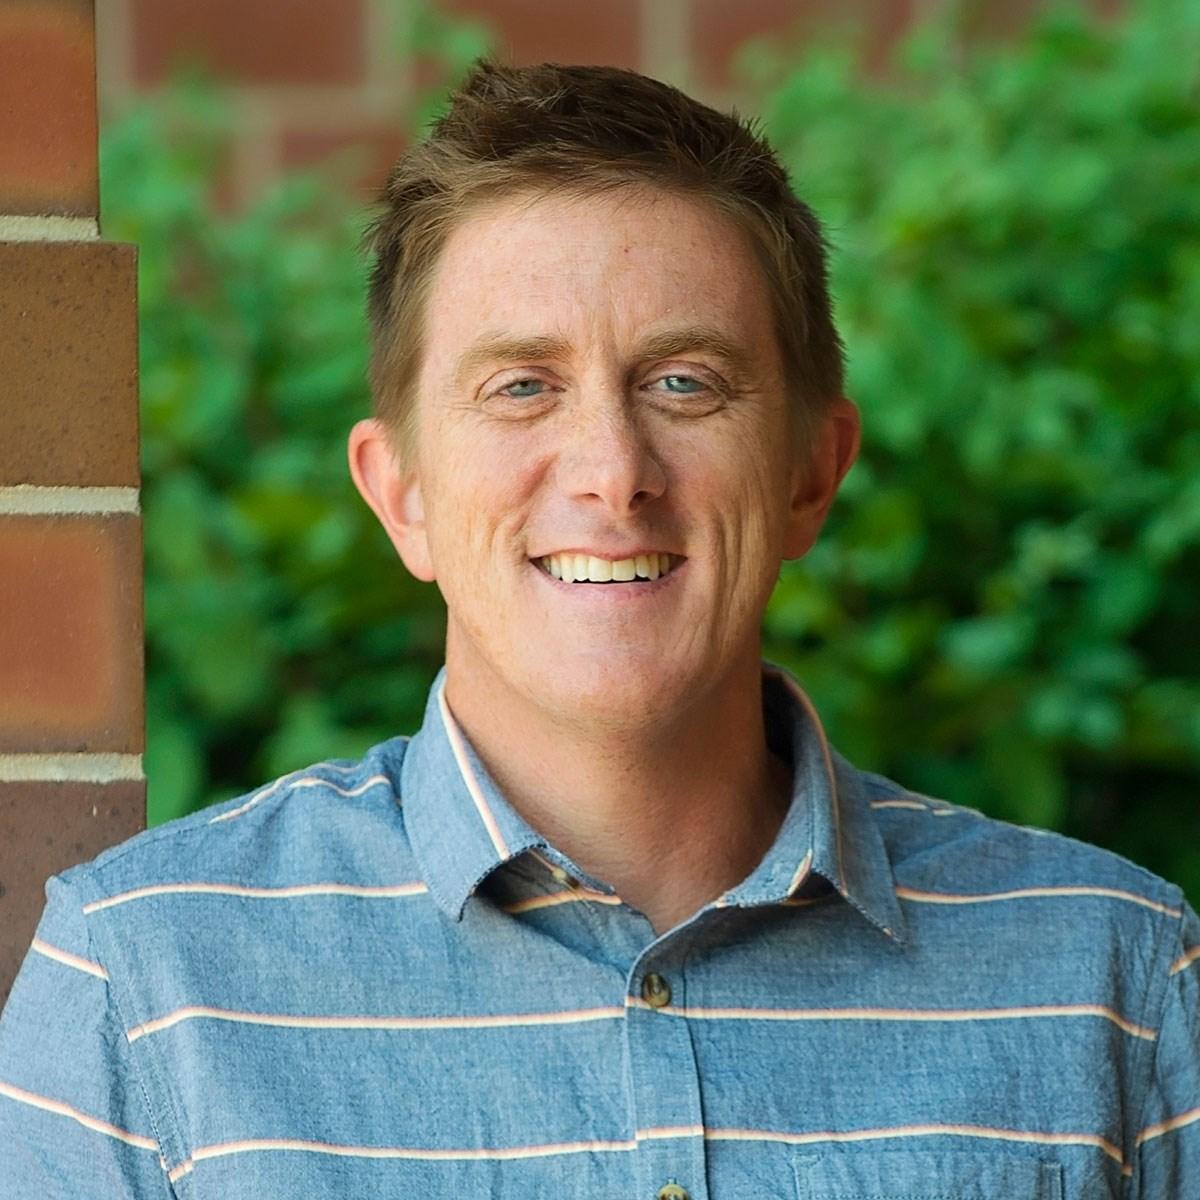 Wichita church pastor Todd Hutchinson